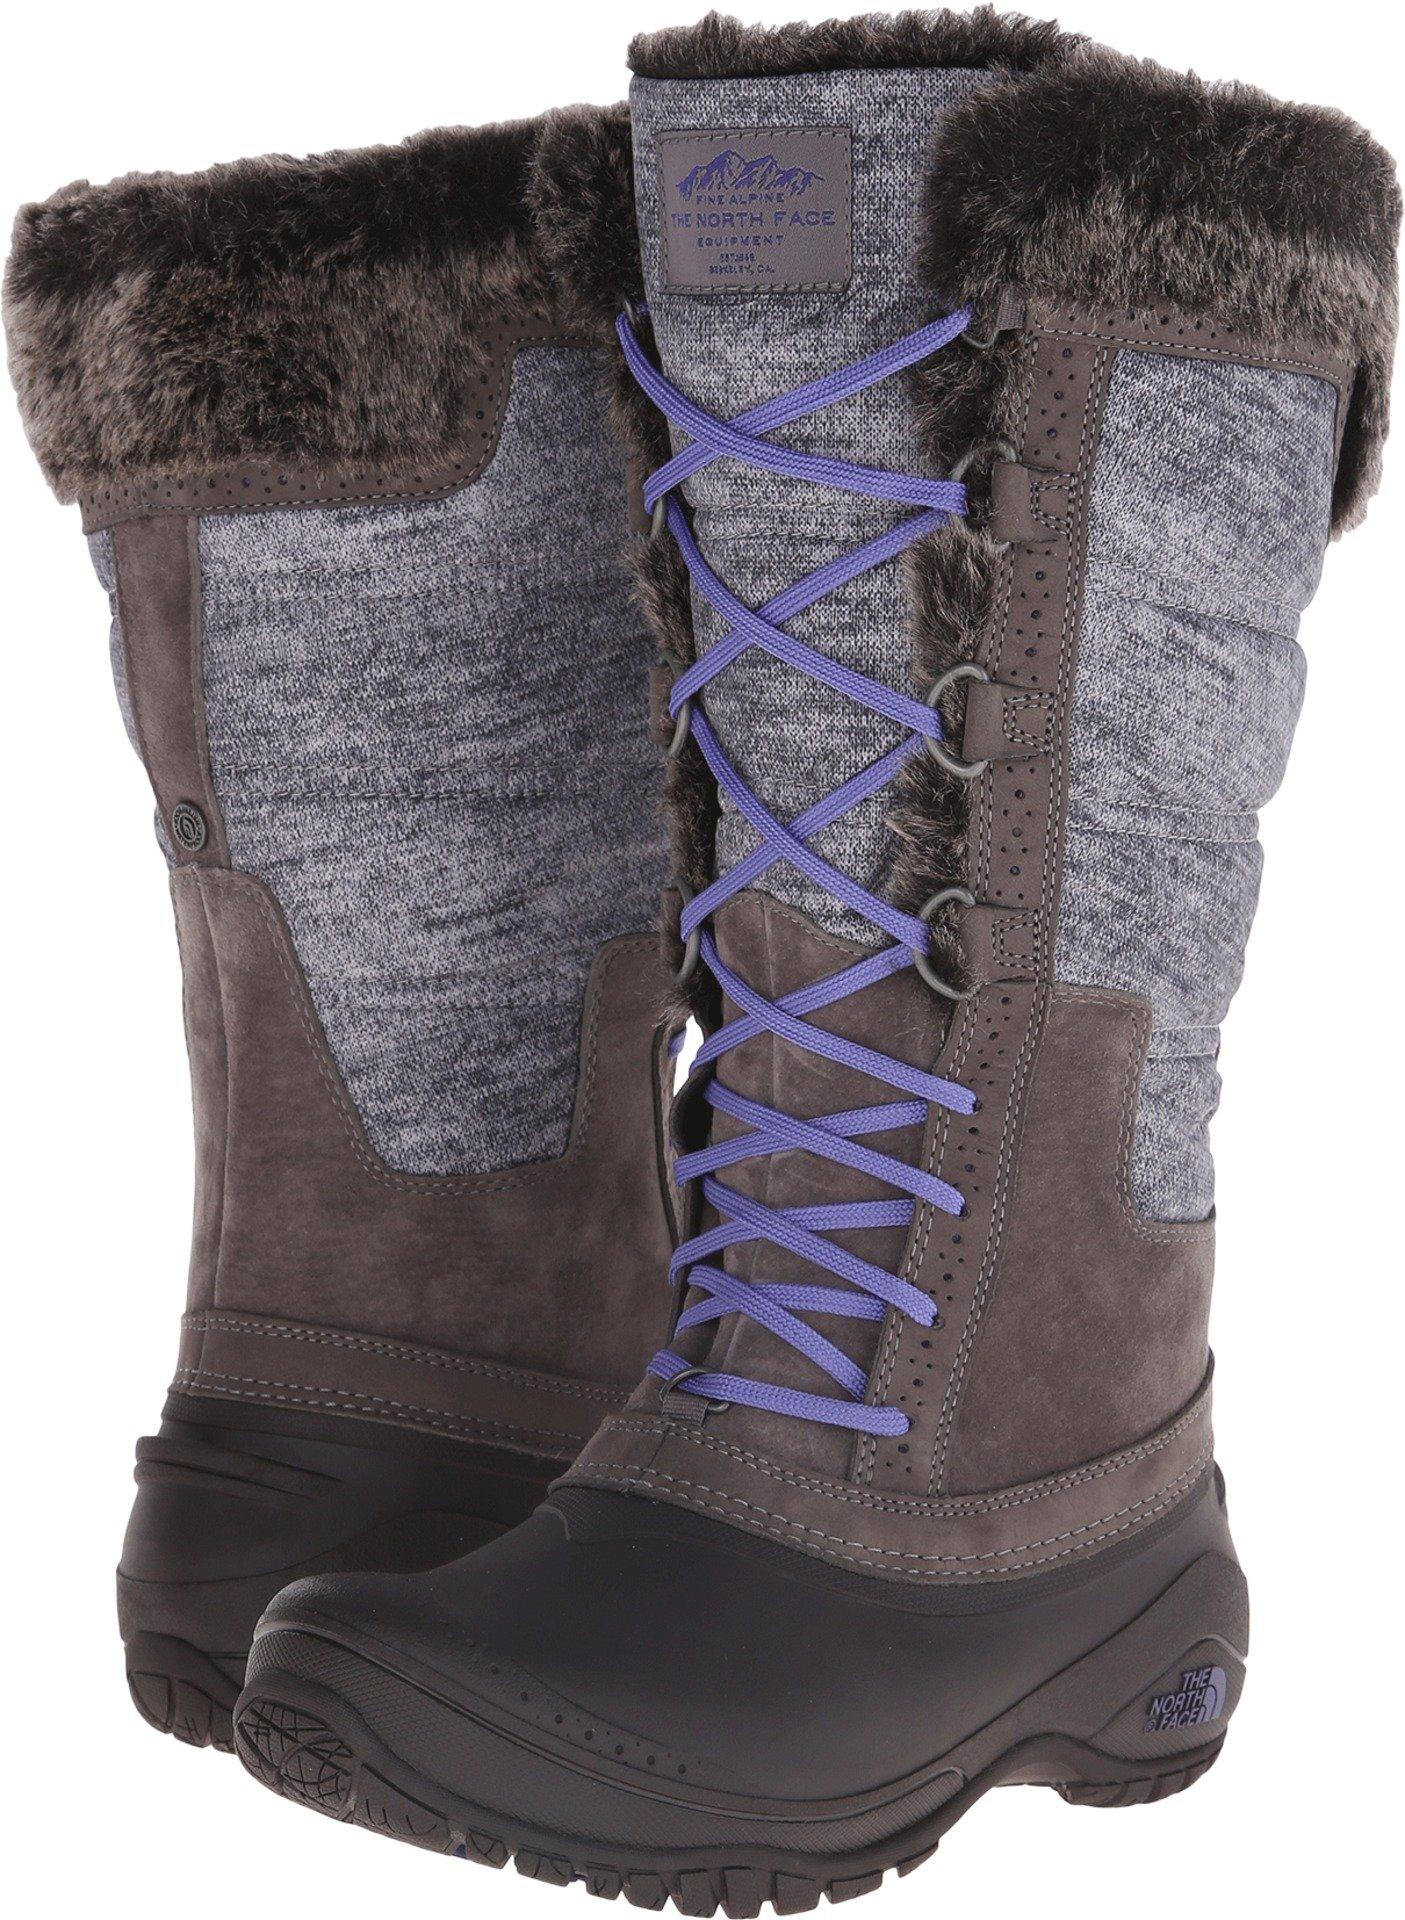 The North Face Shellista II Boot Tall Womens Plum Kitten Grey/Deep Wisteria Purple 7